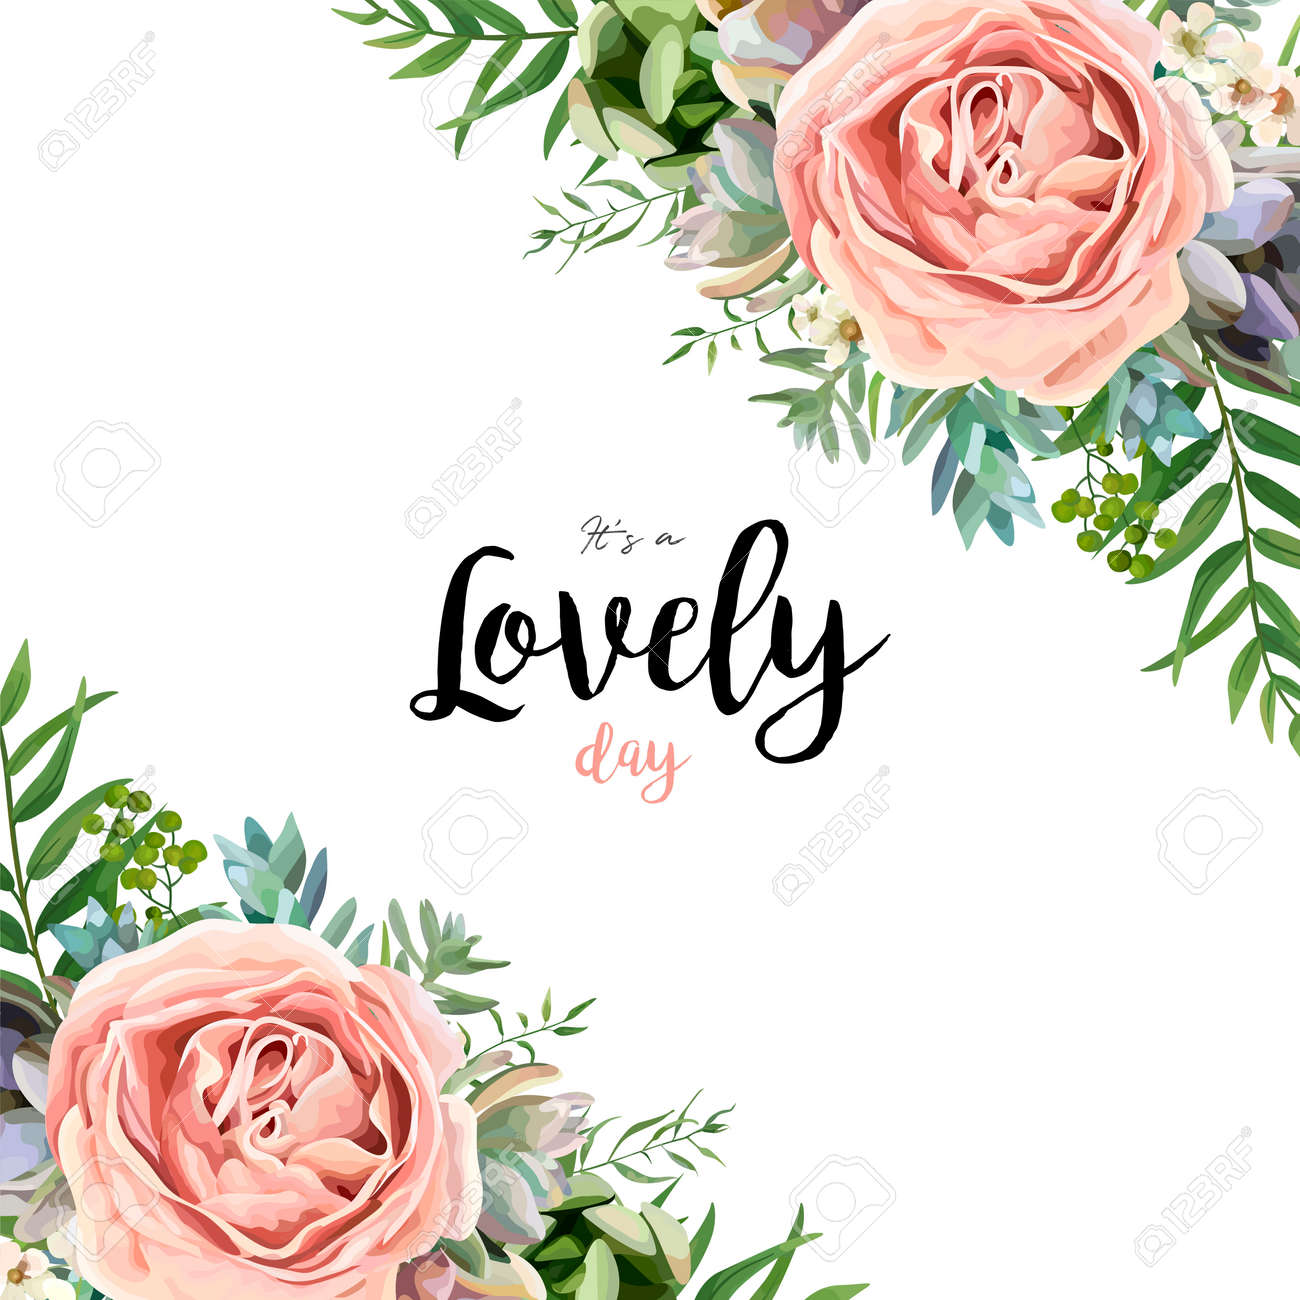 Vector floral card frame bouquet design with garden pink peach lavender Rose wax flower Eucalyptus branch green fern palm leaves succulent berry illustration Watercolor designer corner border template - 92780808